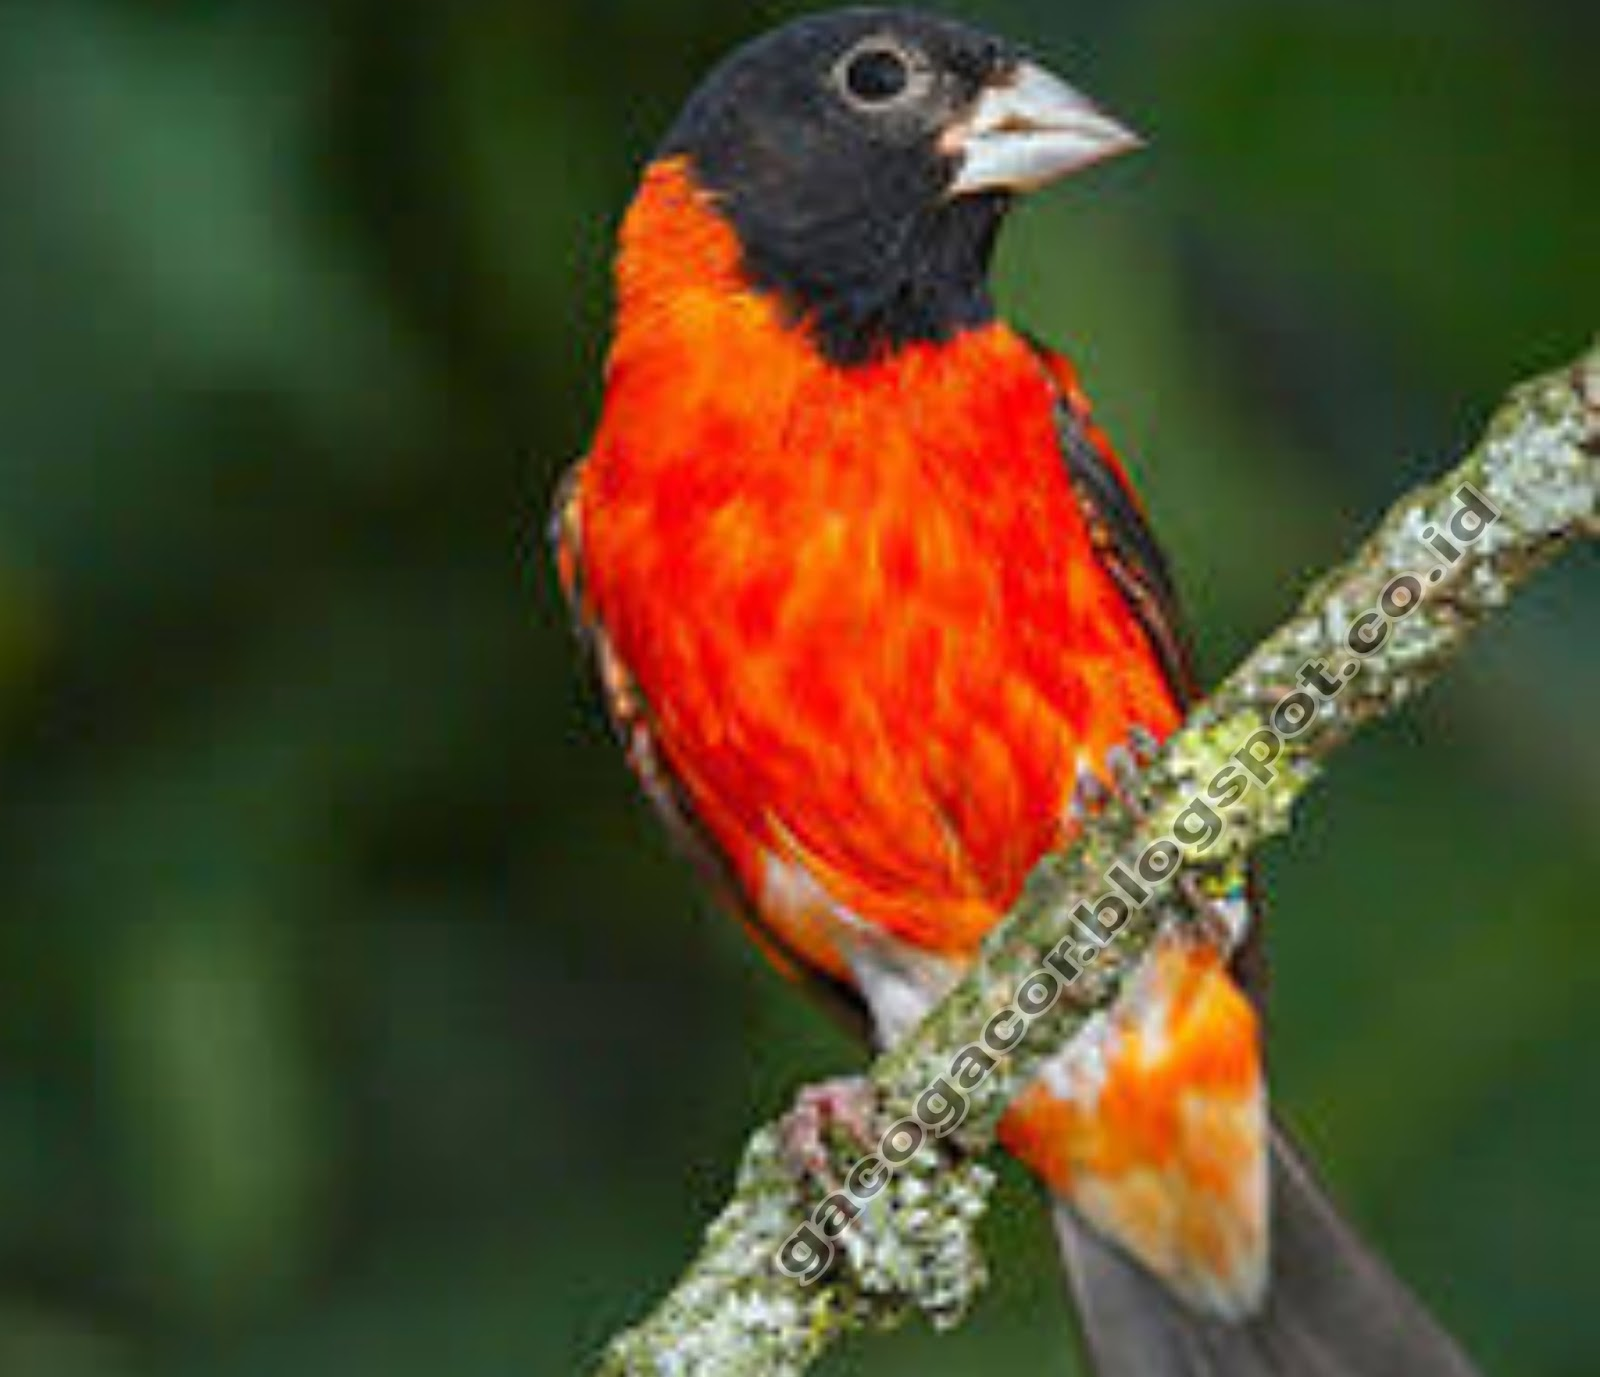 Mengenal Red Siskin Si Burung Cantik Merah Pedas Gaco Gacor